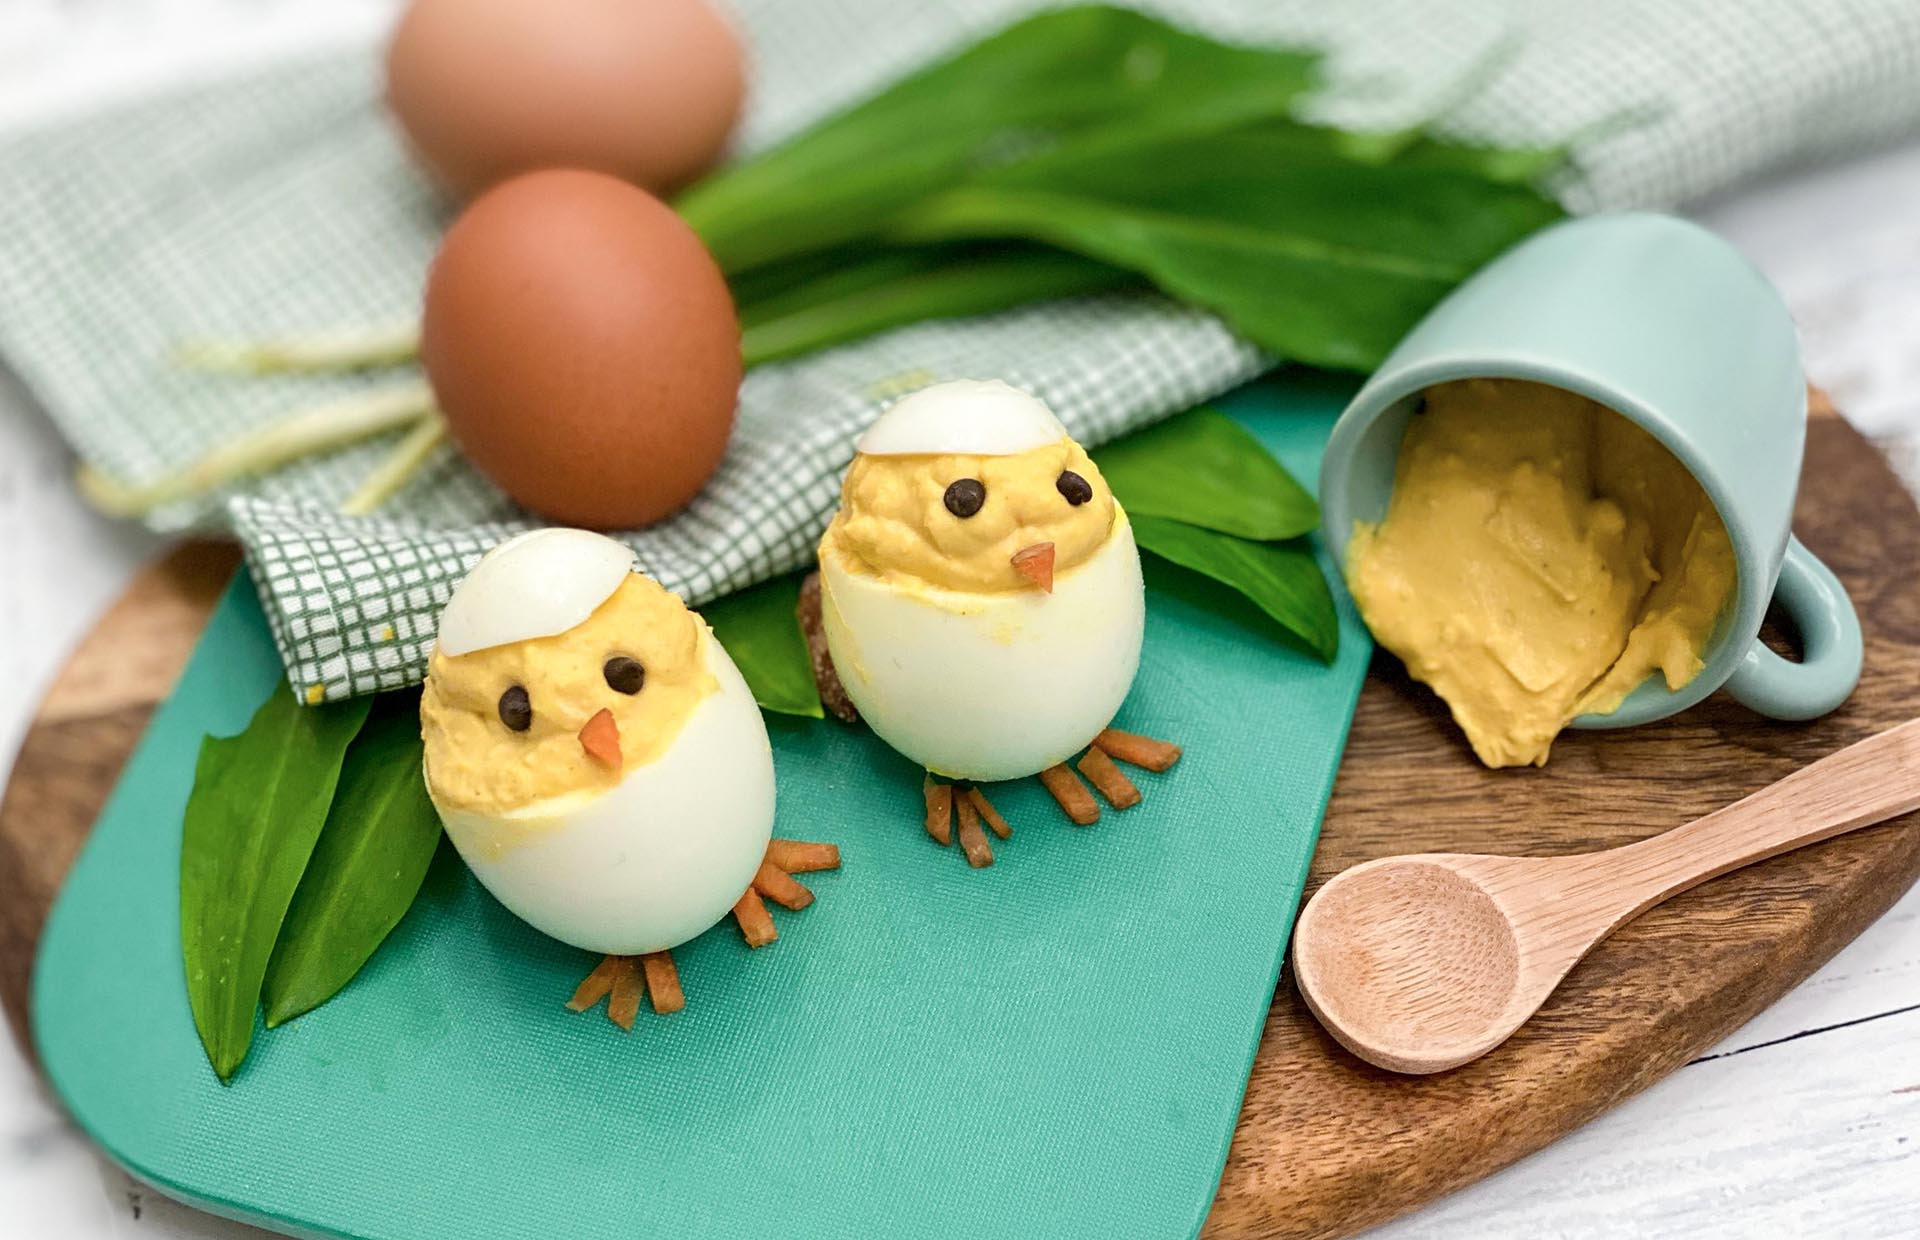 domaća pašteta, klub zdravih navika, kzn, domaća pašteta klub zdravih navika, domaća pašteta kzn, namaz od jaja, domaći namaz od jaja, namaz sa jajima, pašteta sa jajima, uskrsnja jaja, uskrsnji namaz, jaja punjena namazom od jaja, uskrsnji motivi, pile od jaja, slanoa, jaja, sos od jaja, dorucak, predjelo, Iceberg Salat Centar